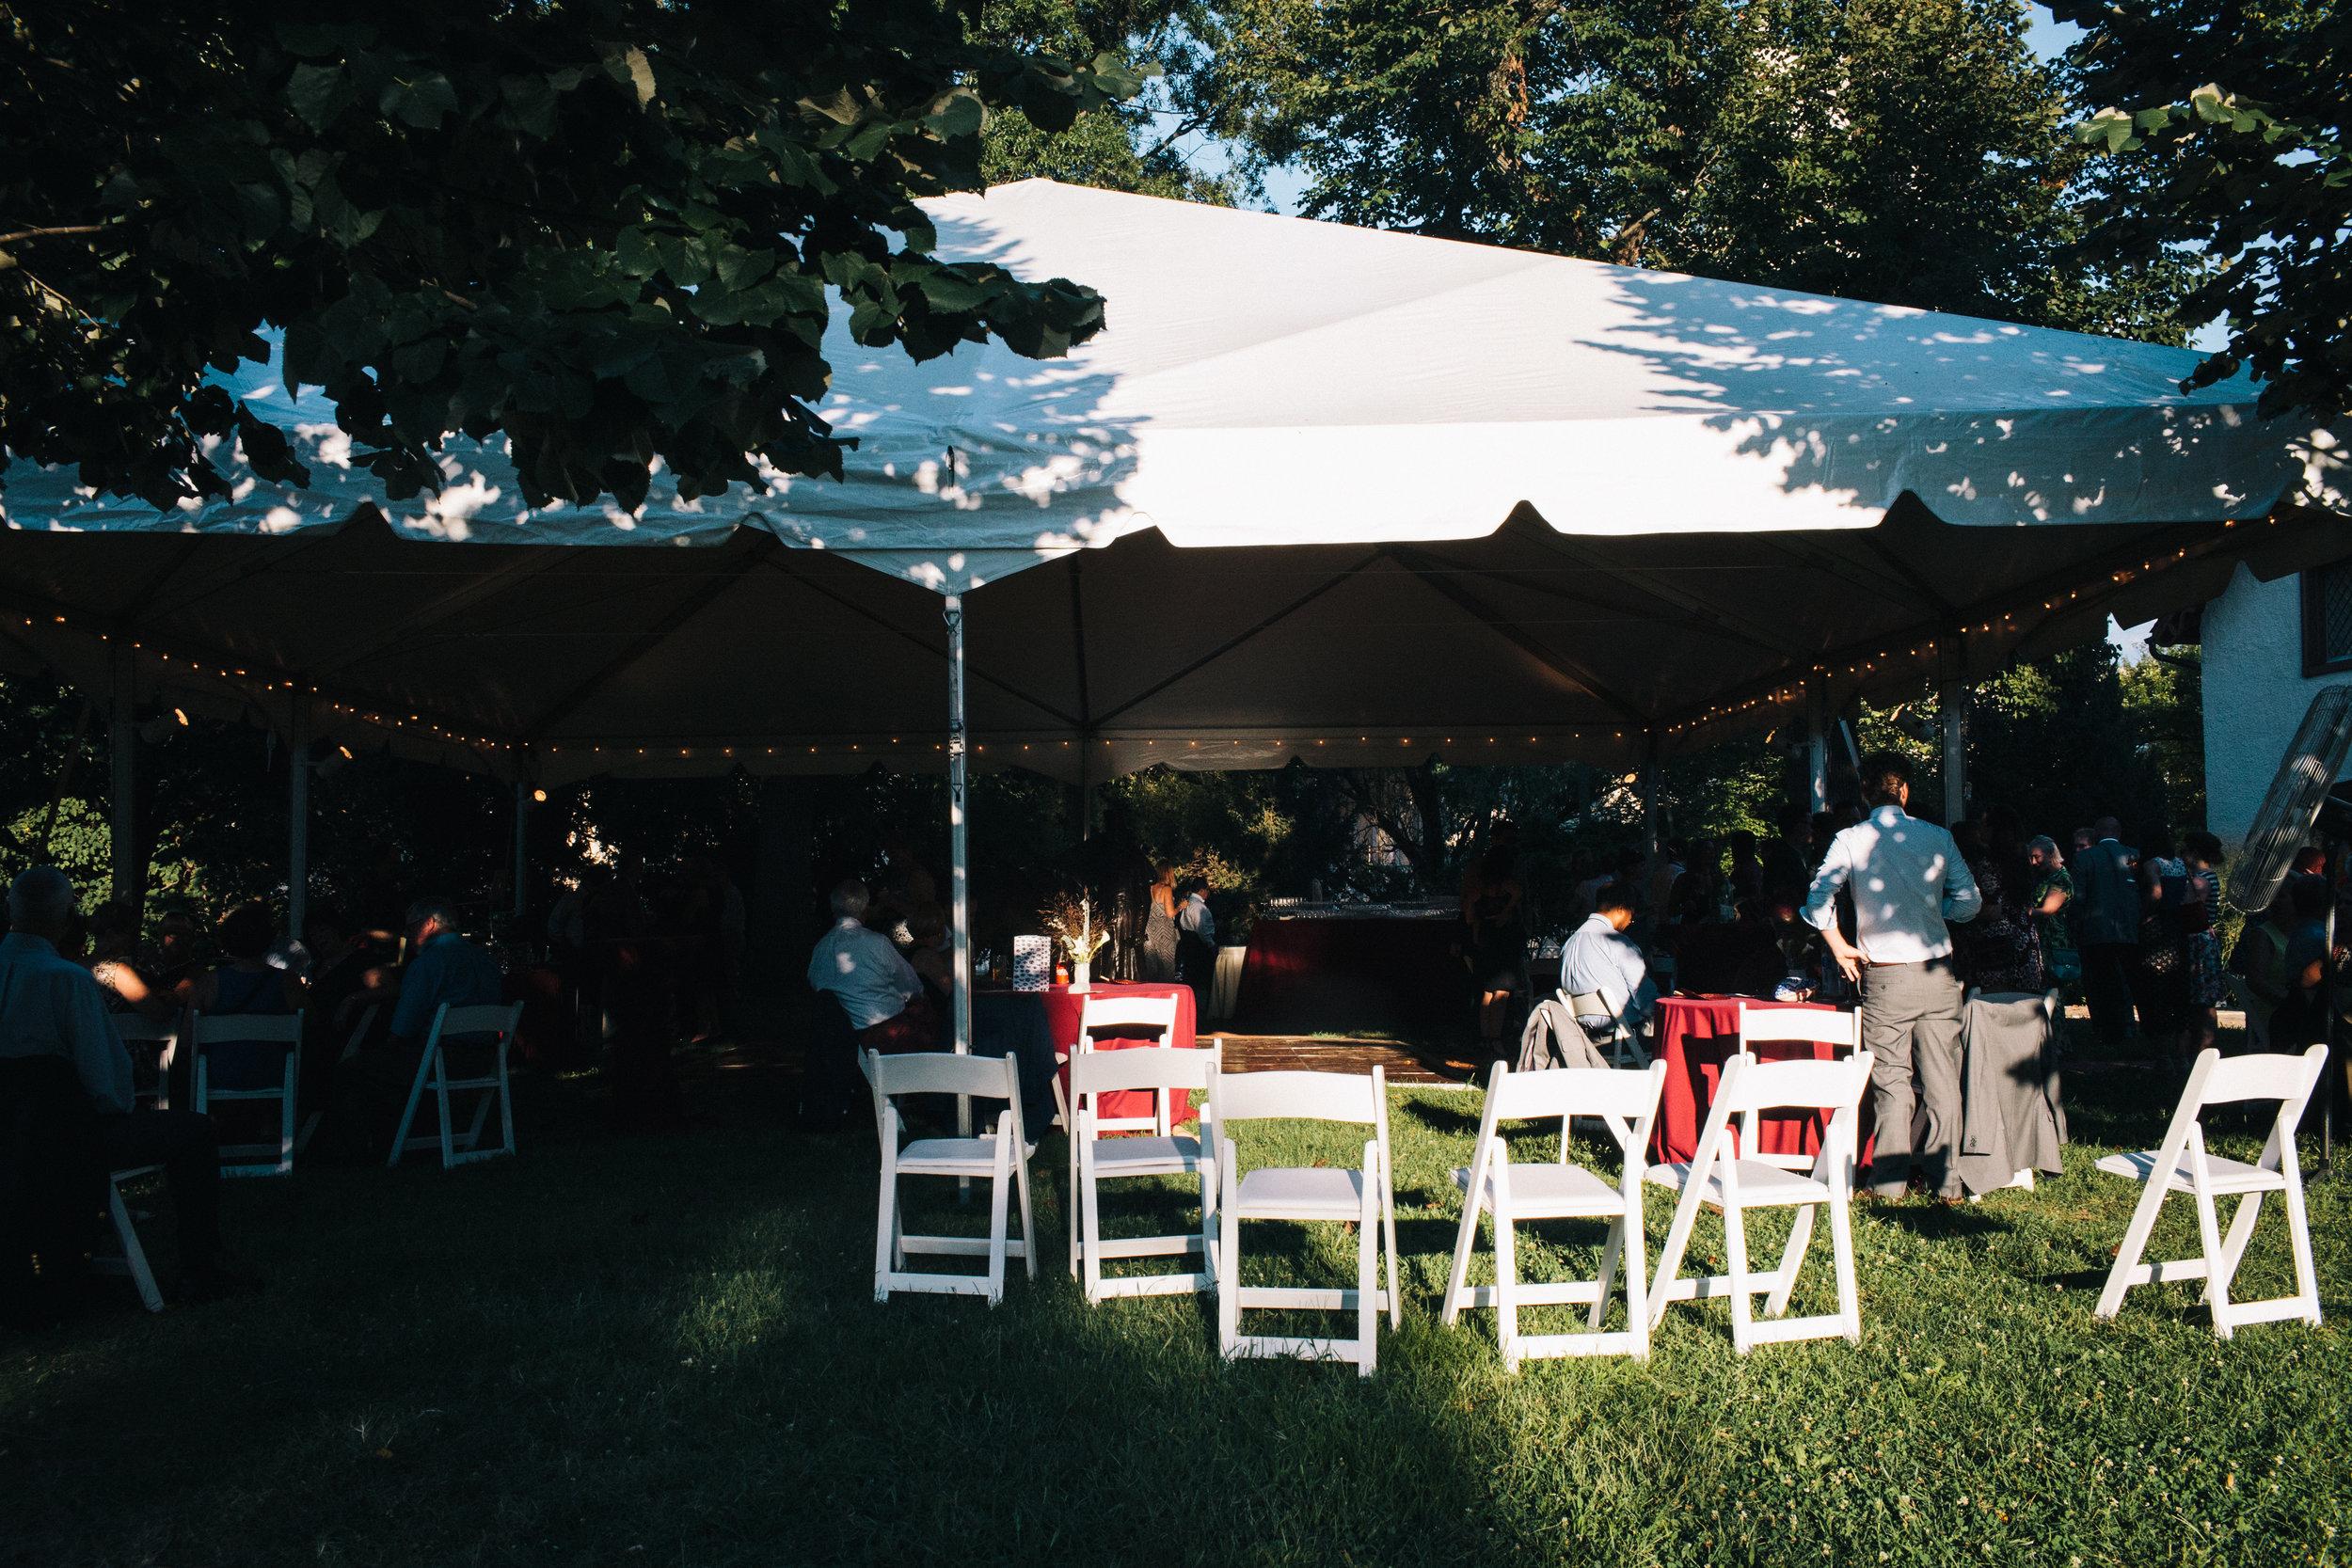 Harlan_LeeHart_Wedding-106.jpg